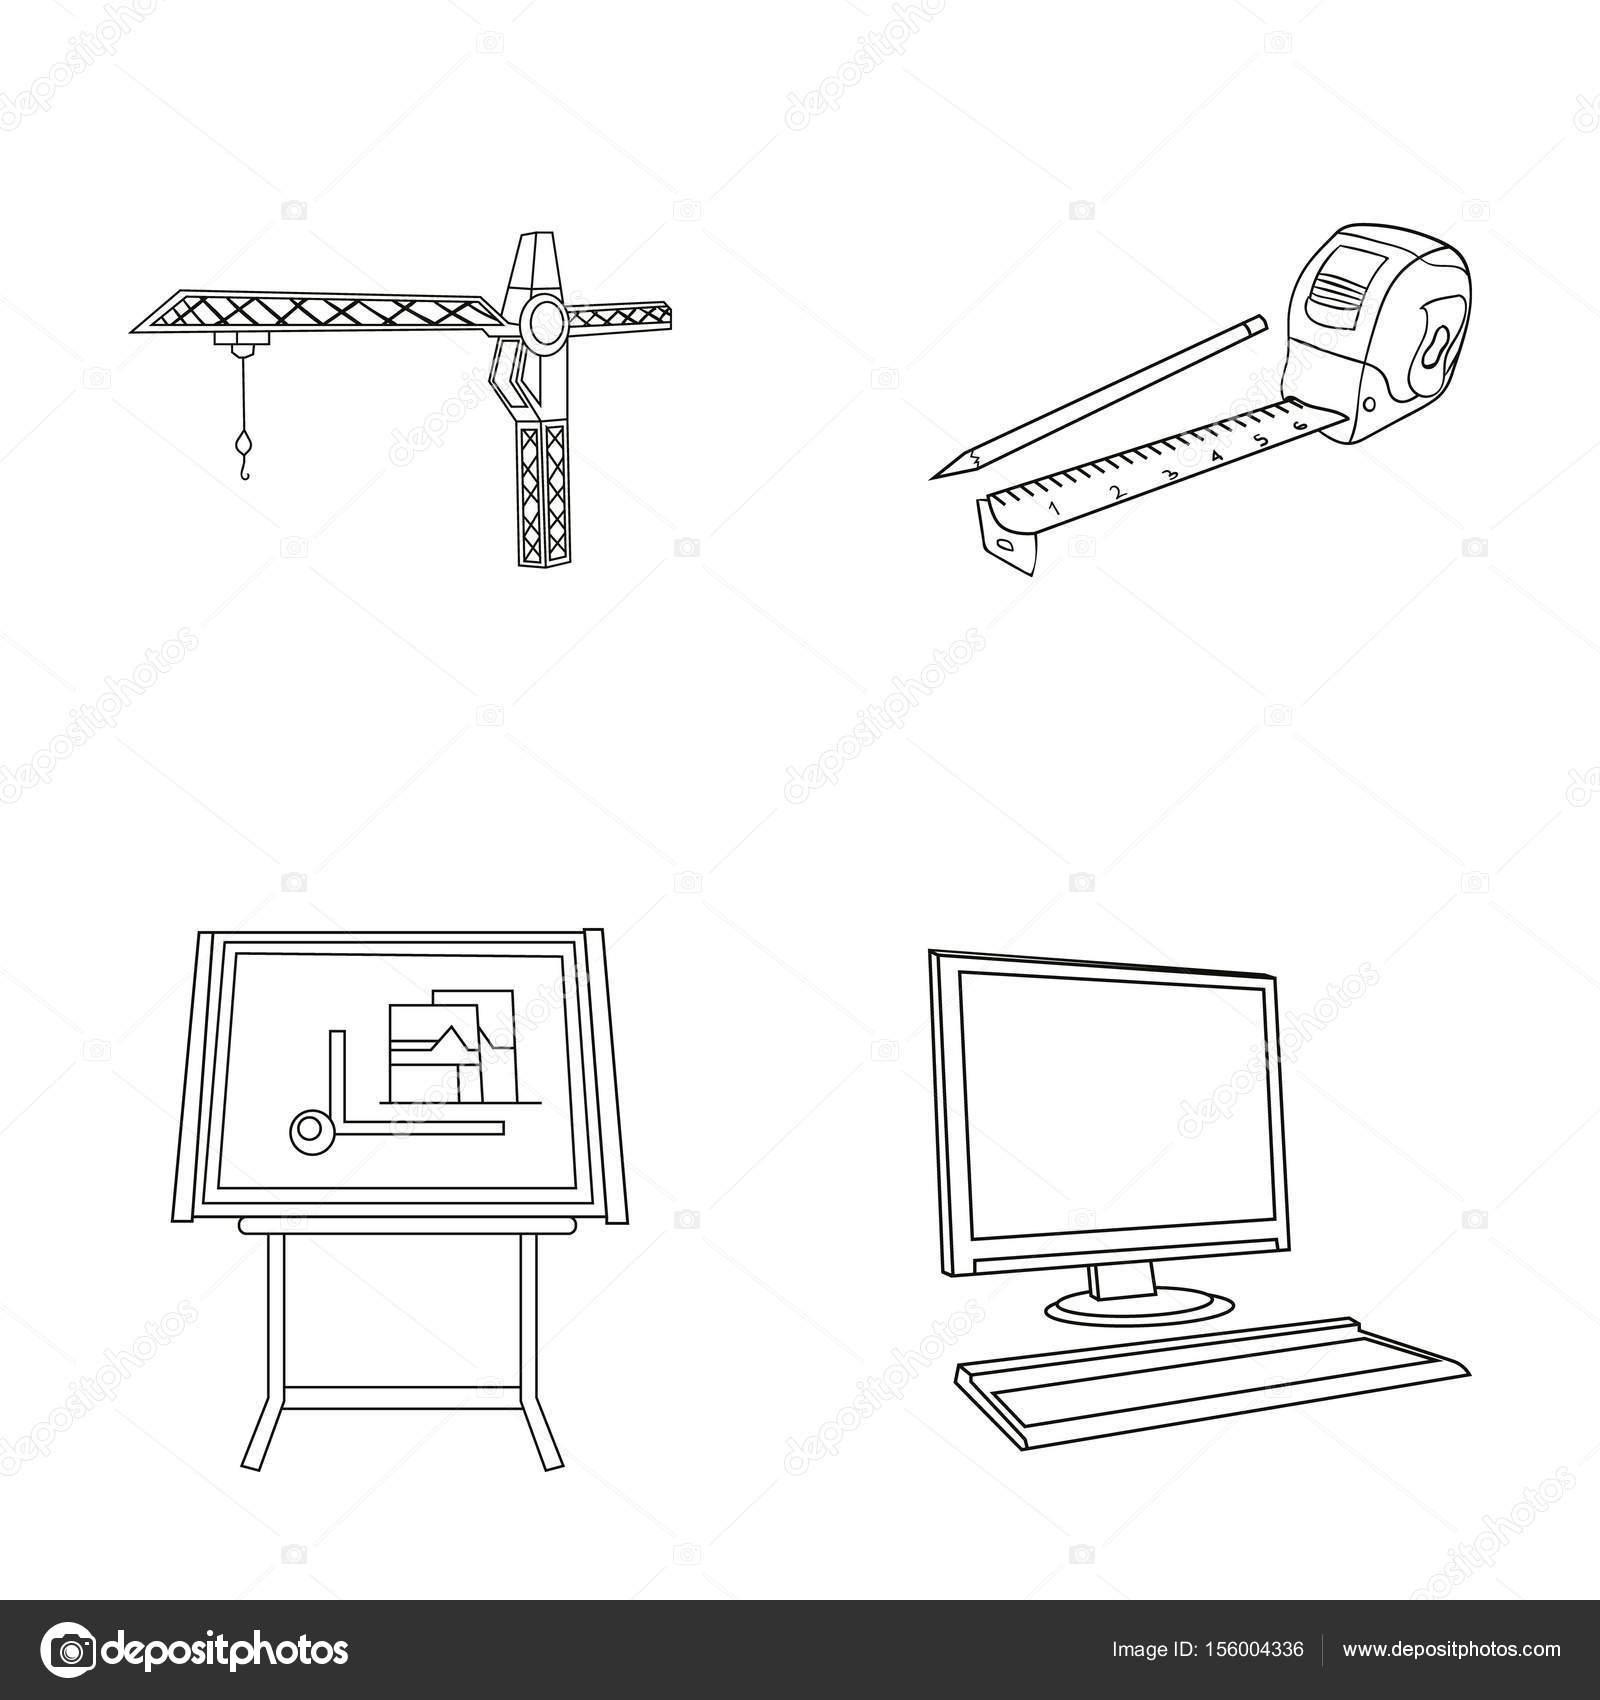 construction crane measuring tape measure drawing board computer rh depositphotos com Parts of a Tape Measure Tape- Measure